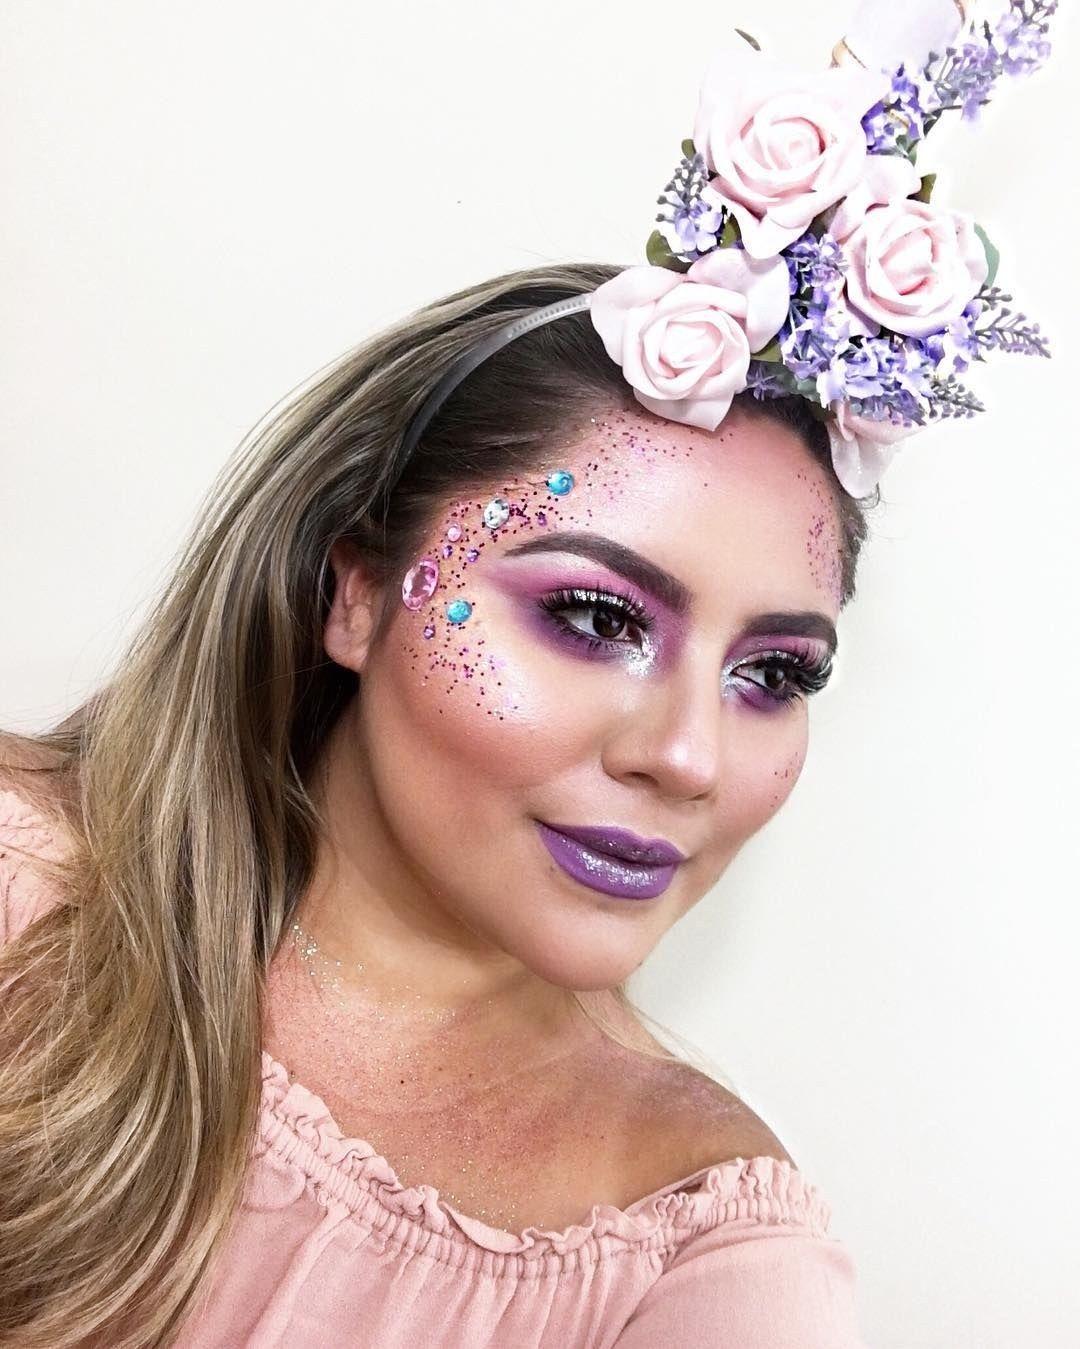 48cc979e34e6 41 Unicorn Halloween Makeup Ideas Perfect for 2018 | Unicorns ✨